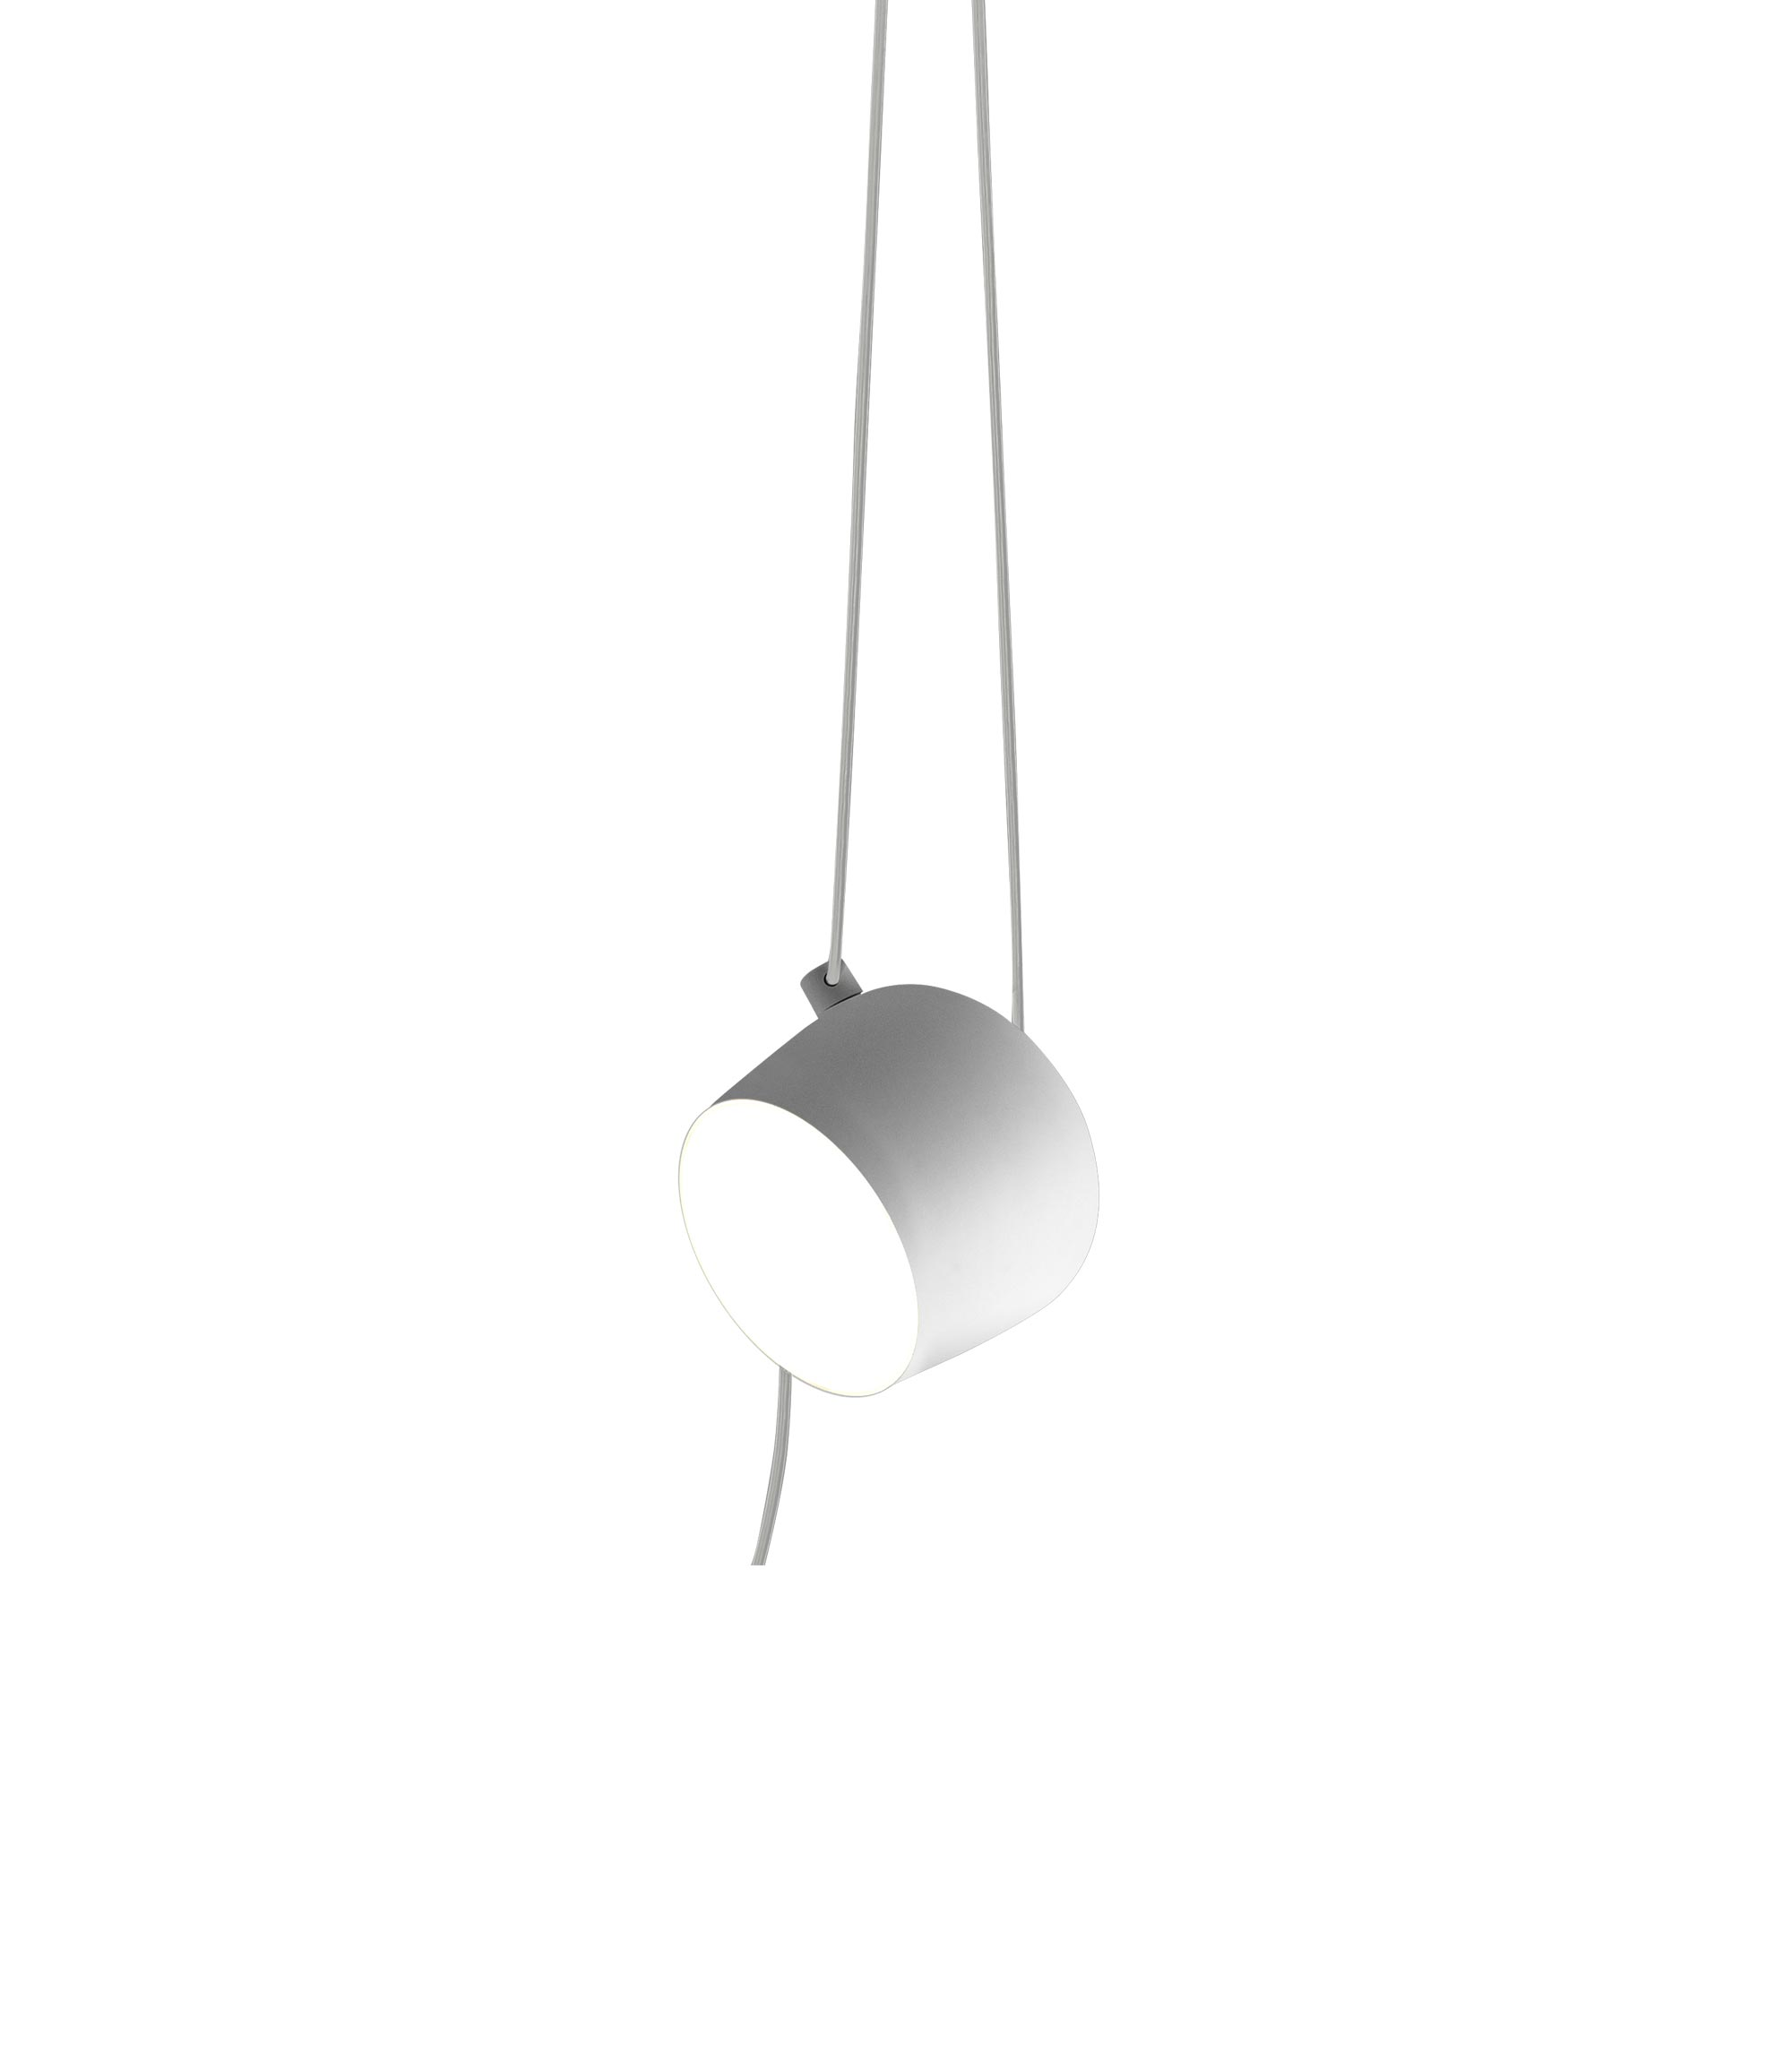 Aim suspension bouroullec flos F0092009 product still life big